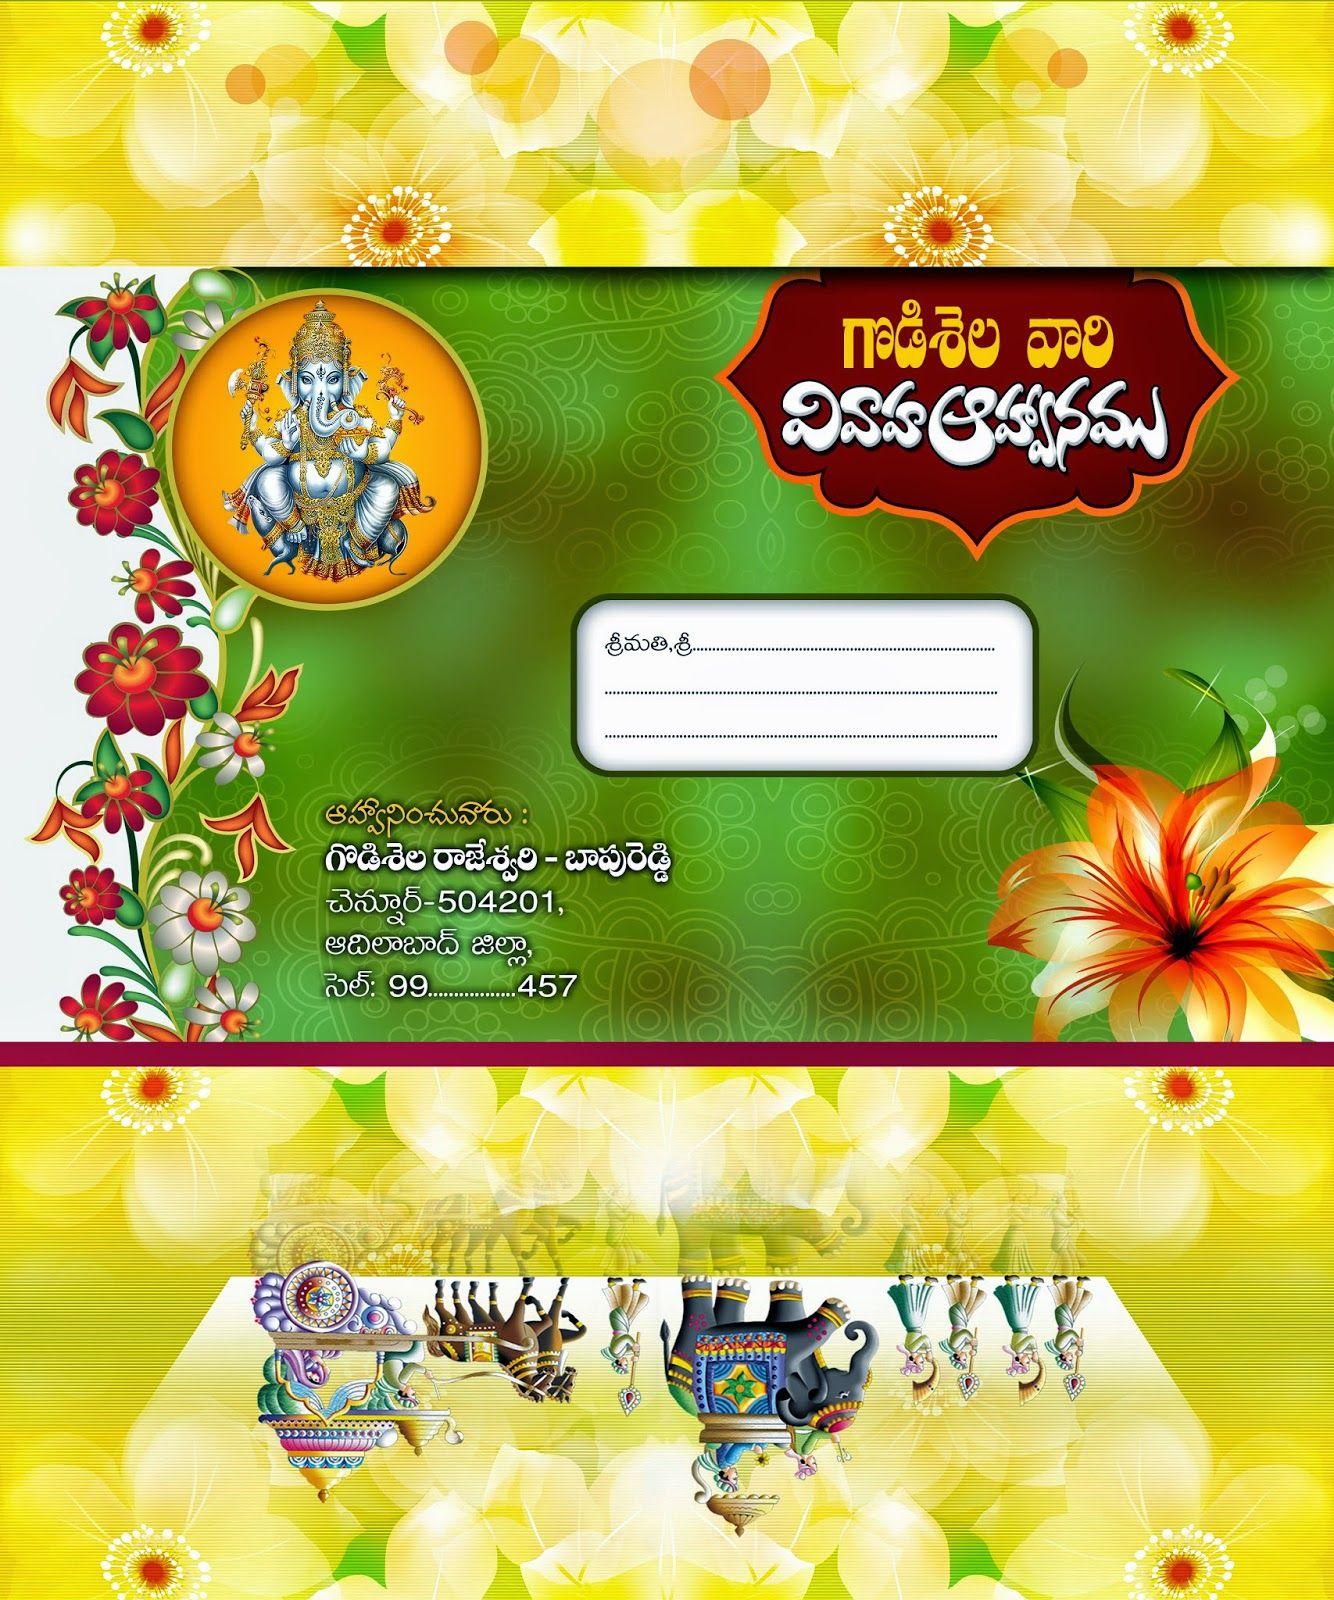 Cover_2 Wedding designs Pinterest Wedding card